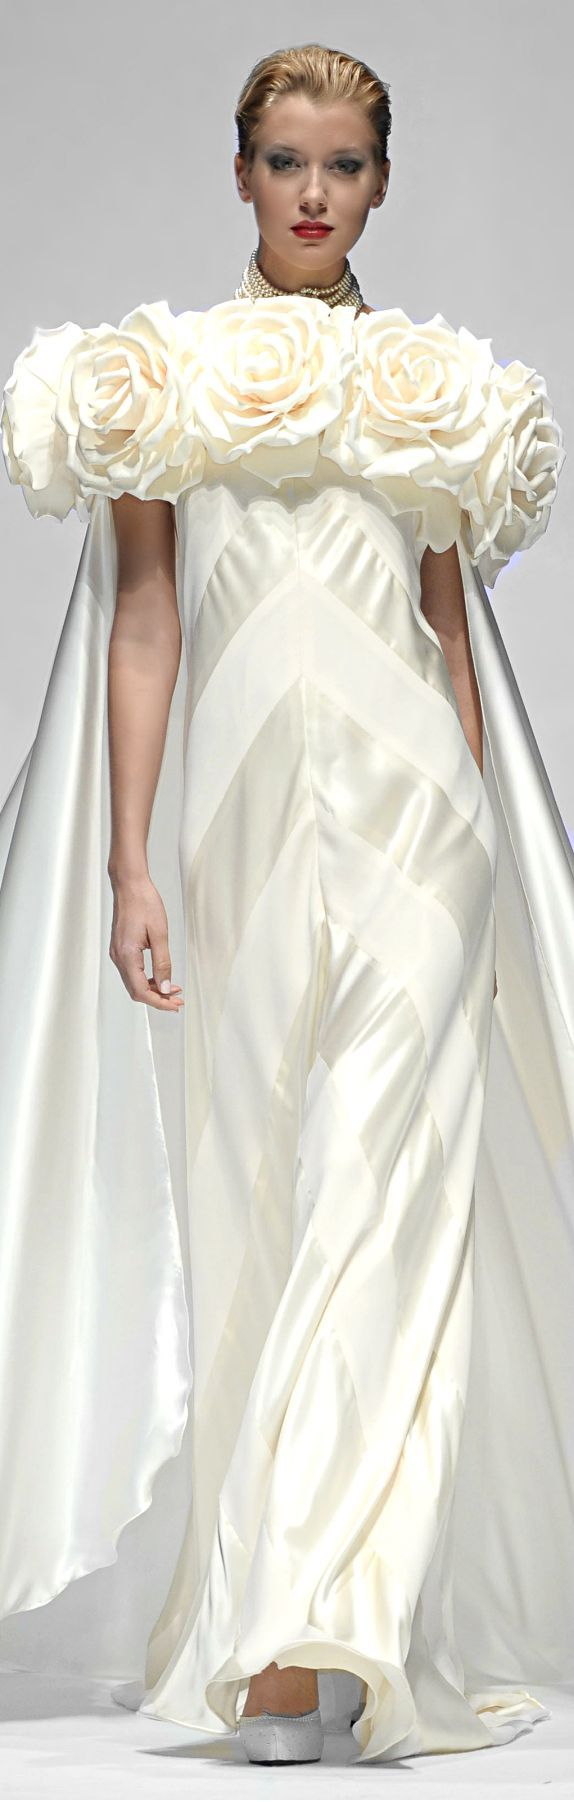 Renato Balestra/ amazing/  sophisticated wedding gown <3